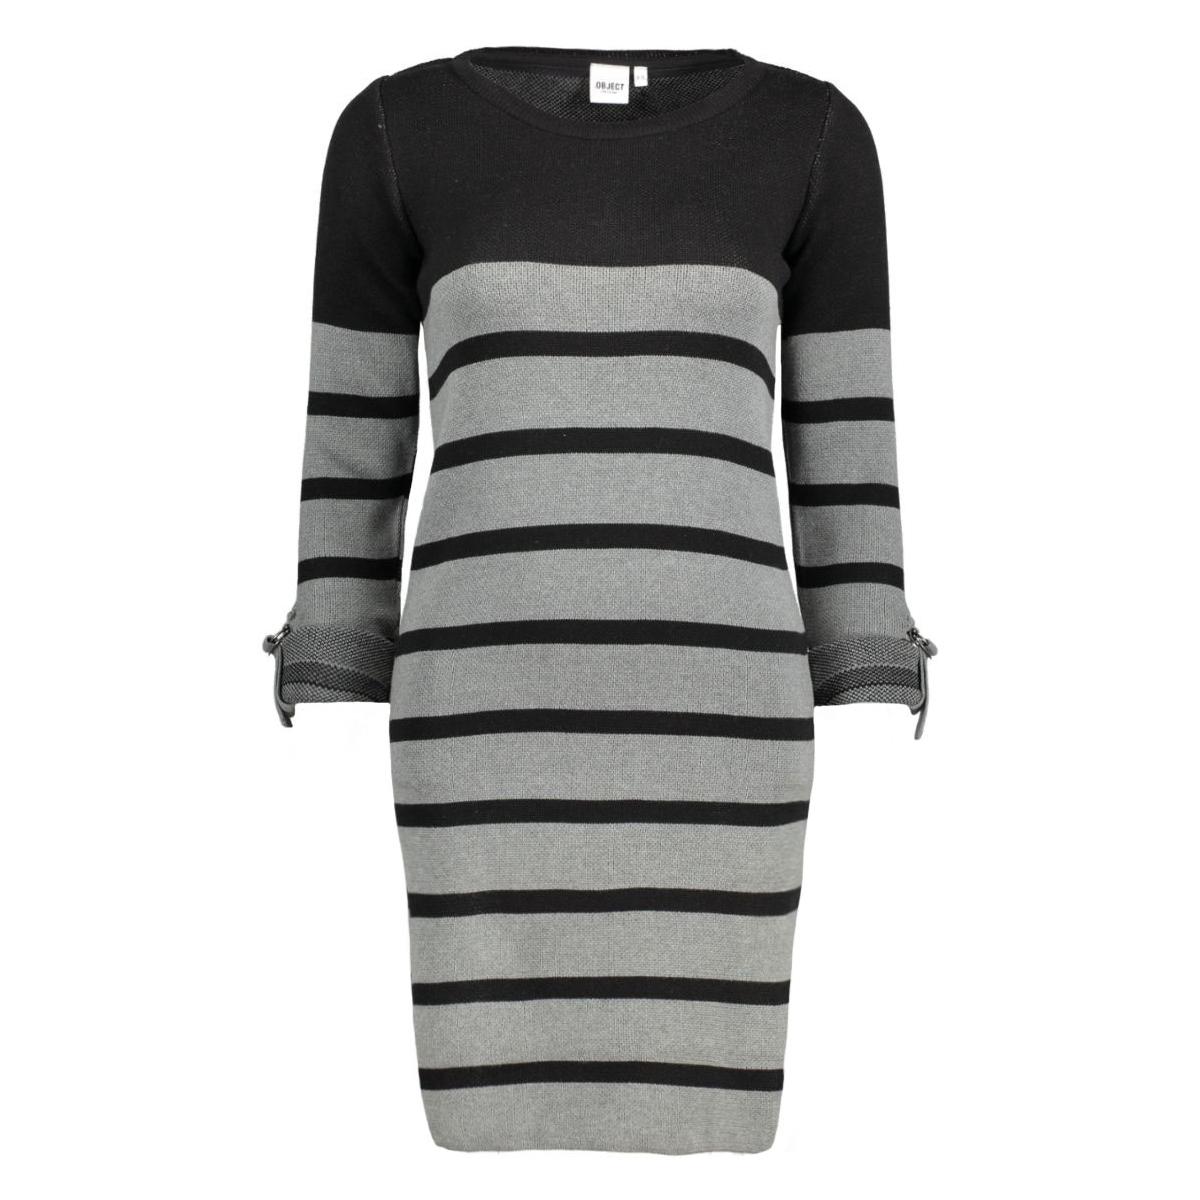 objmy l/s dress noos 23022846 object jurk black w. mgm stripes